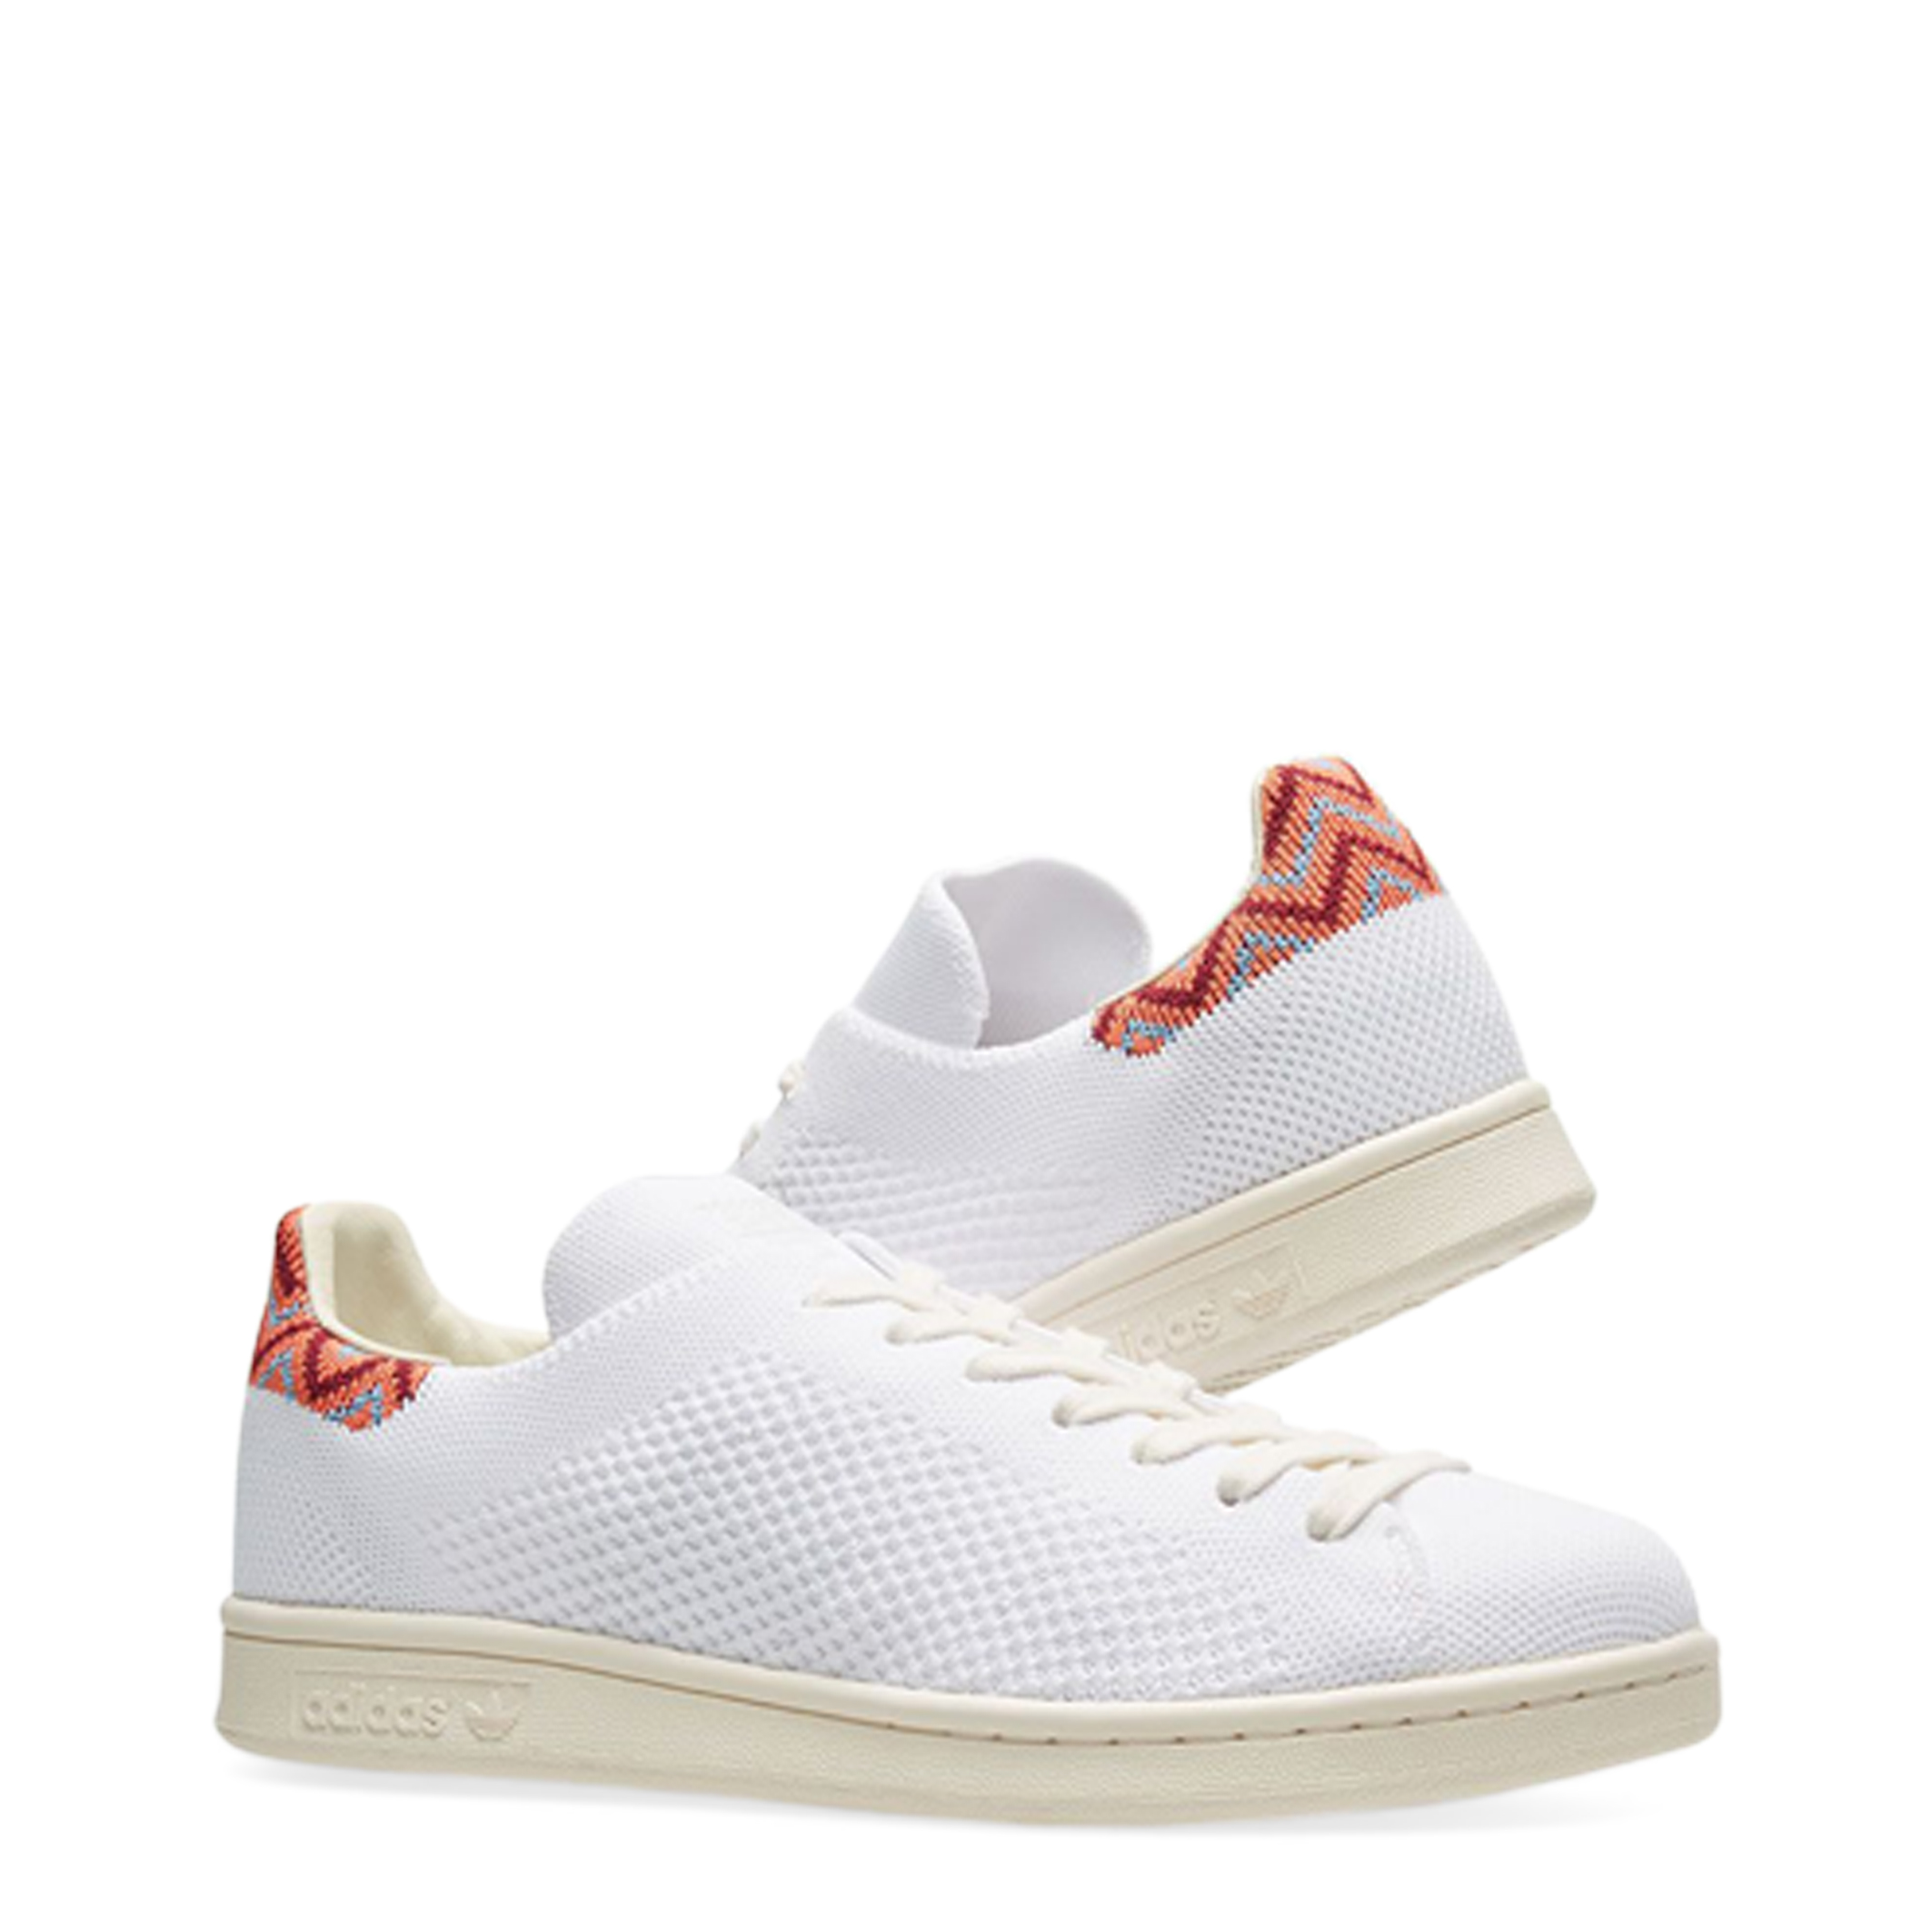 Baskets / Sport  Adidas StanSmith_Primeknit white